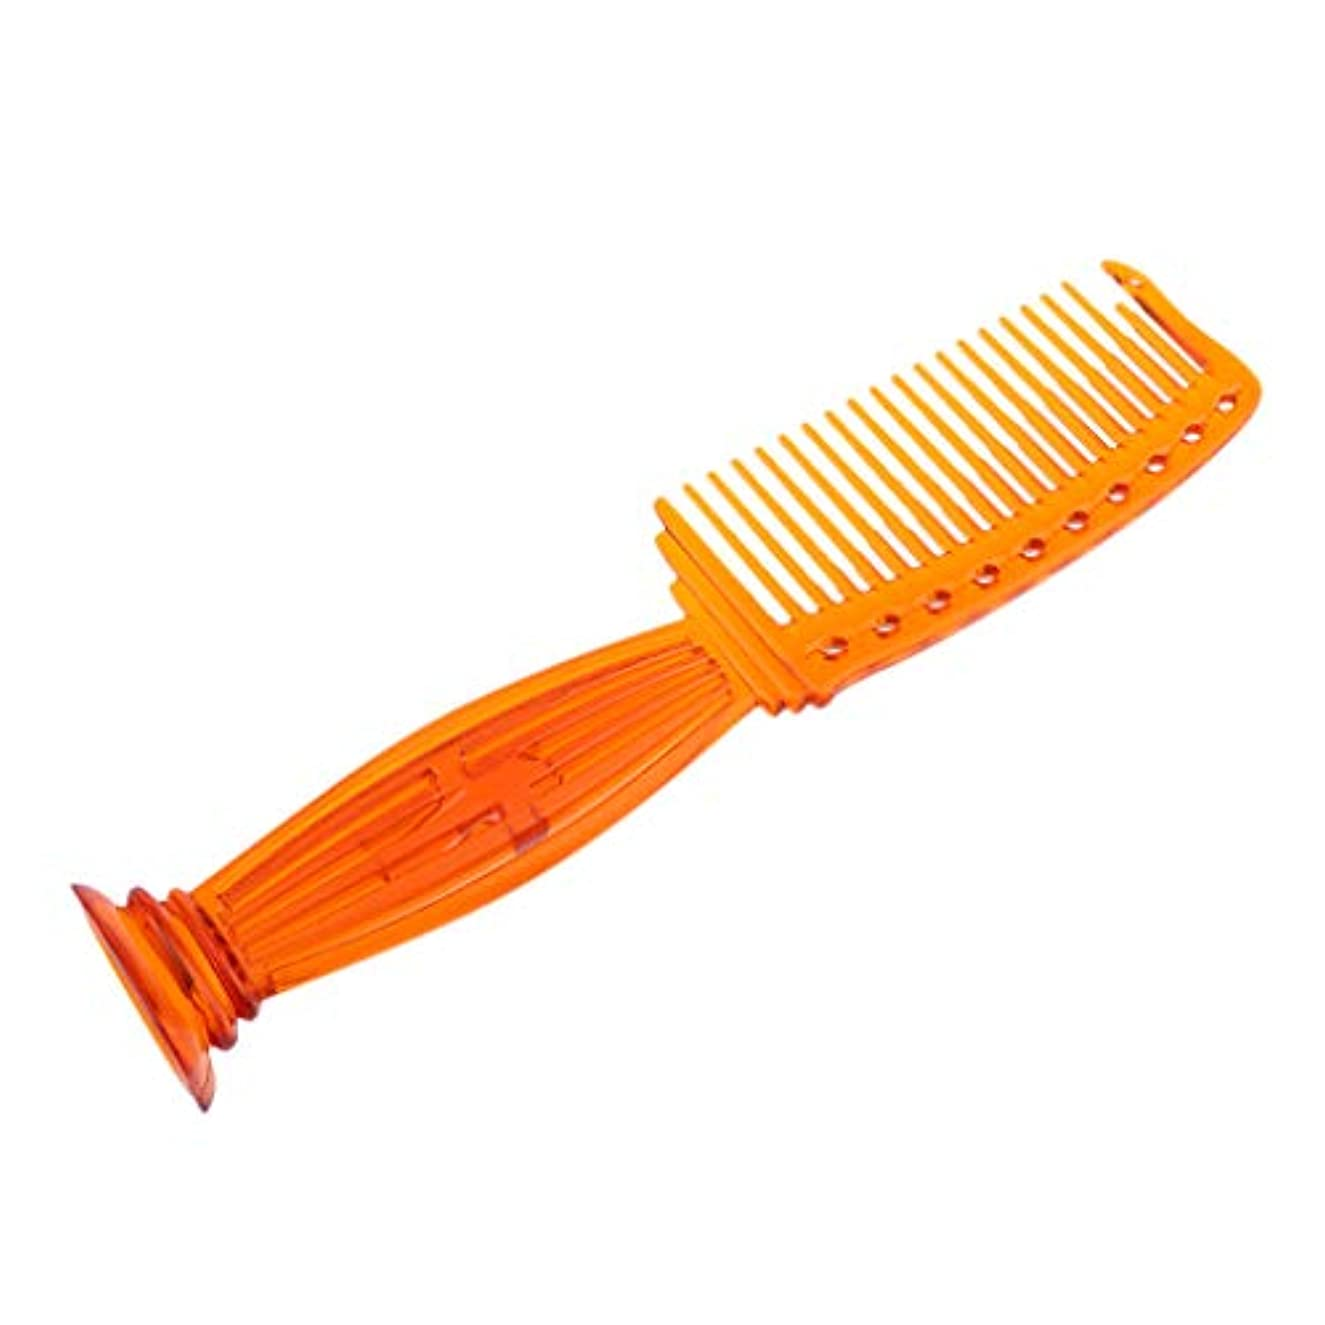 CUTICATE ヘアコーム ヘアブラシ プラスチック櫛 ワイド歯 プロ ヘアサロン 理髪師 全5色選べ - オレンジ